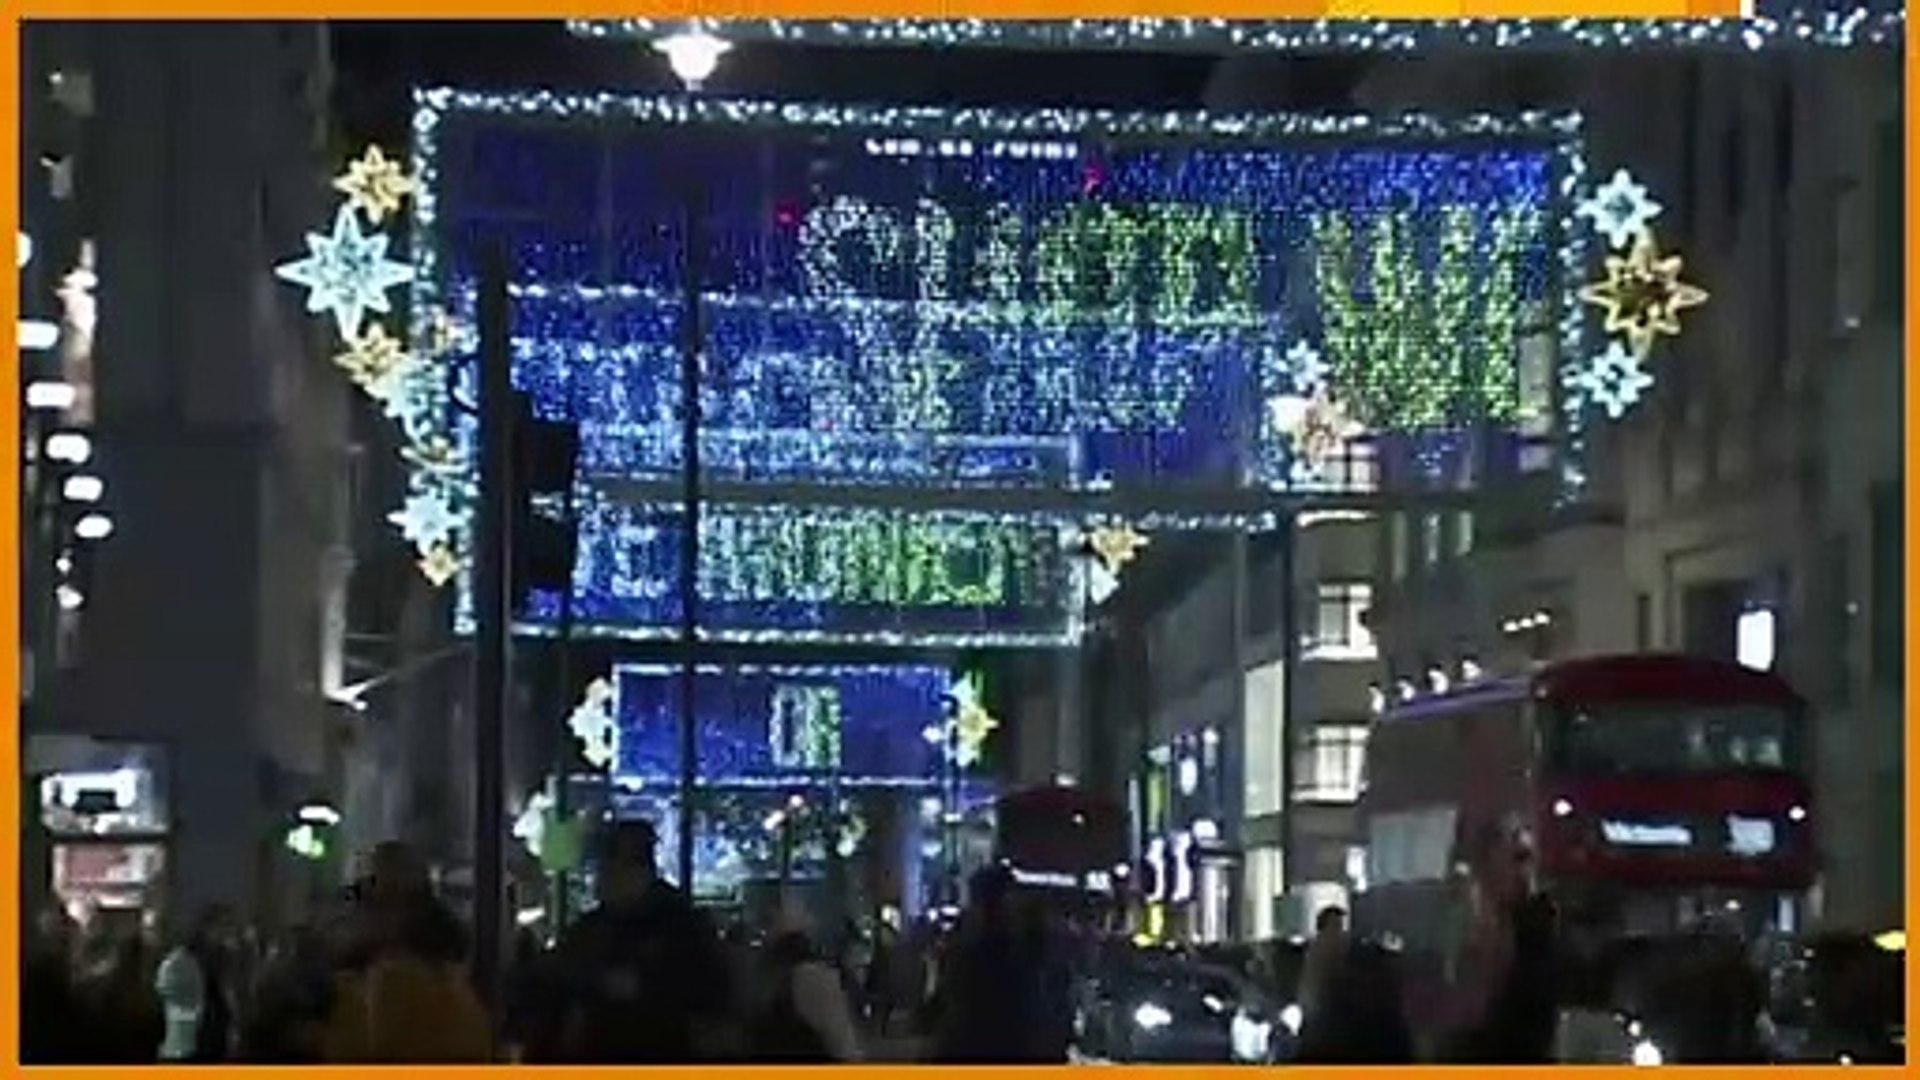 London Christmas lights celebrate 2020 heroes